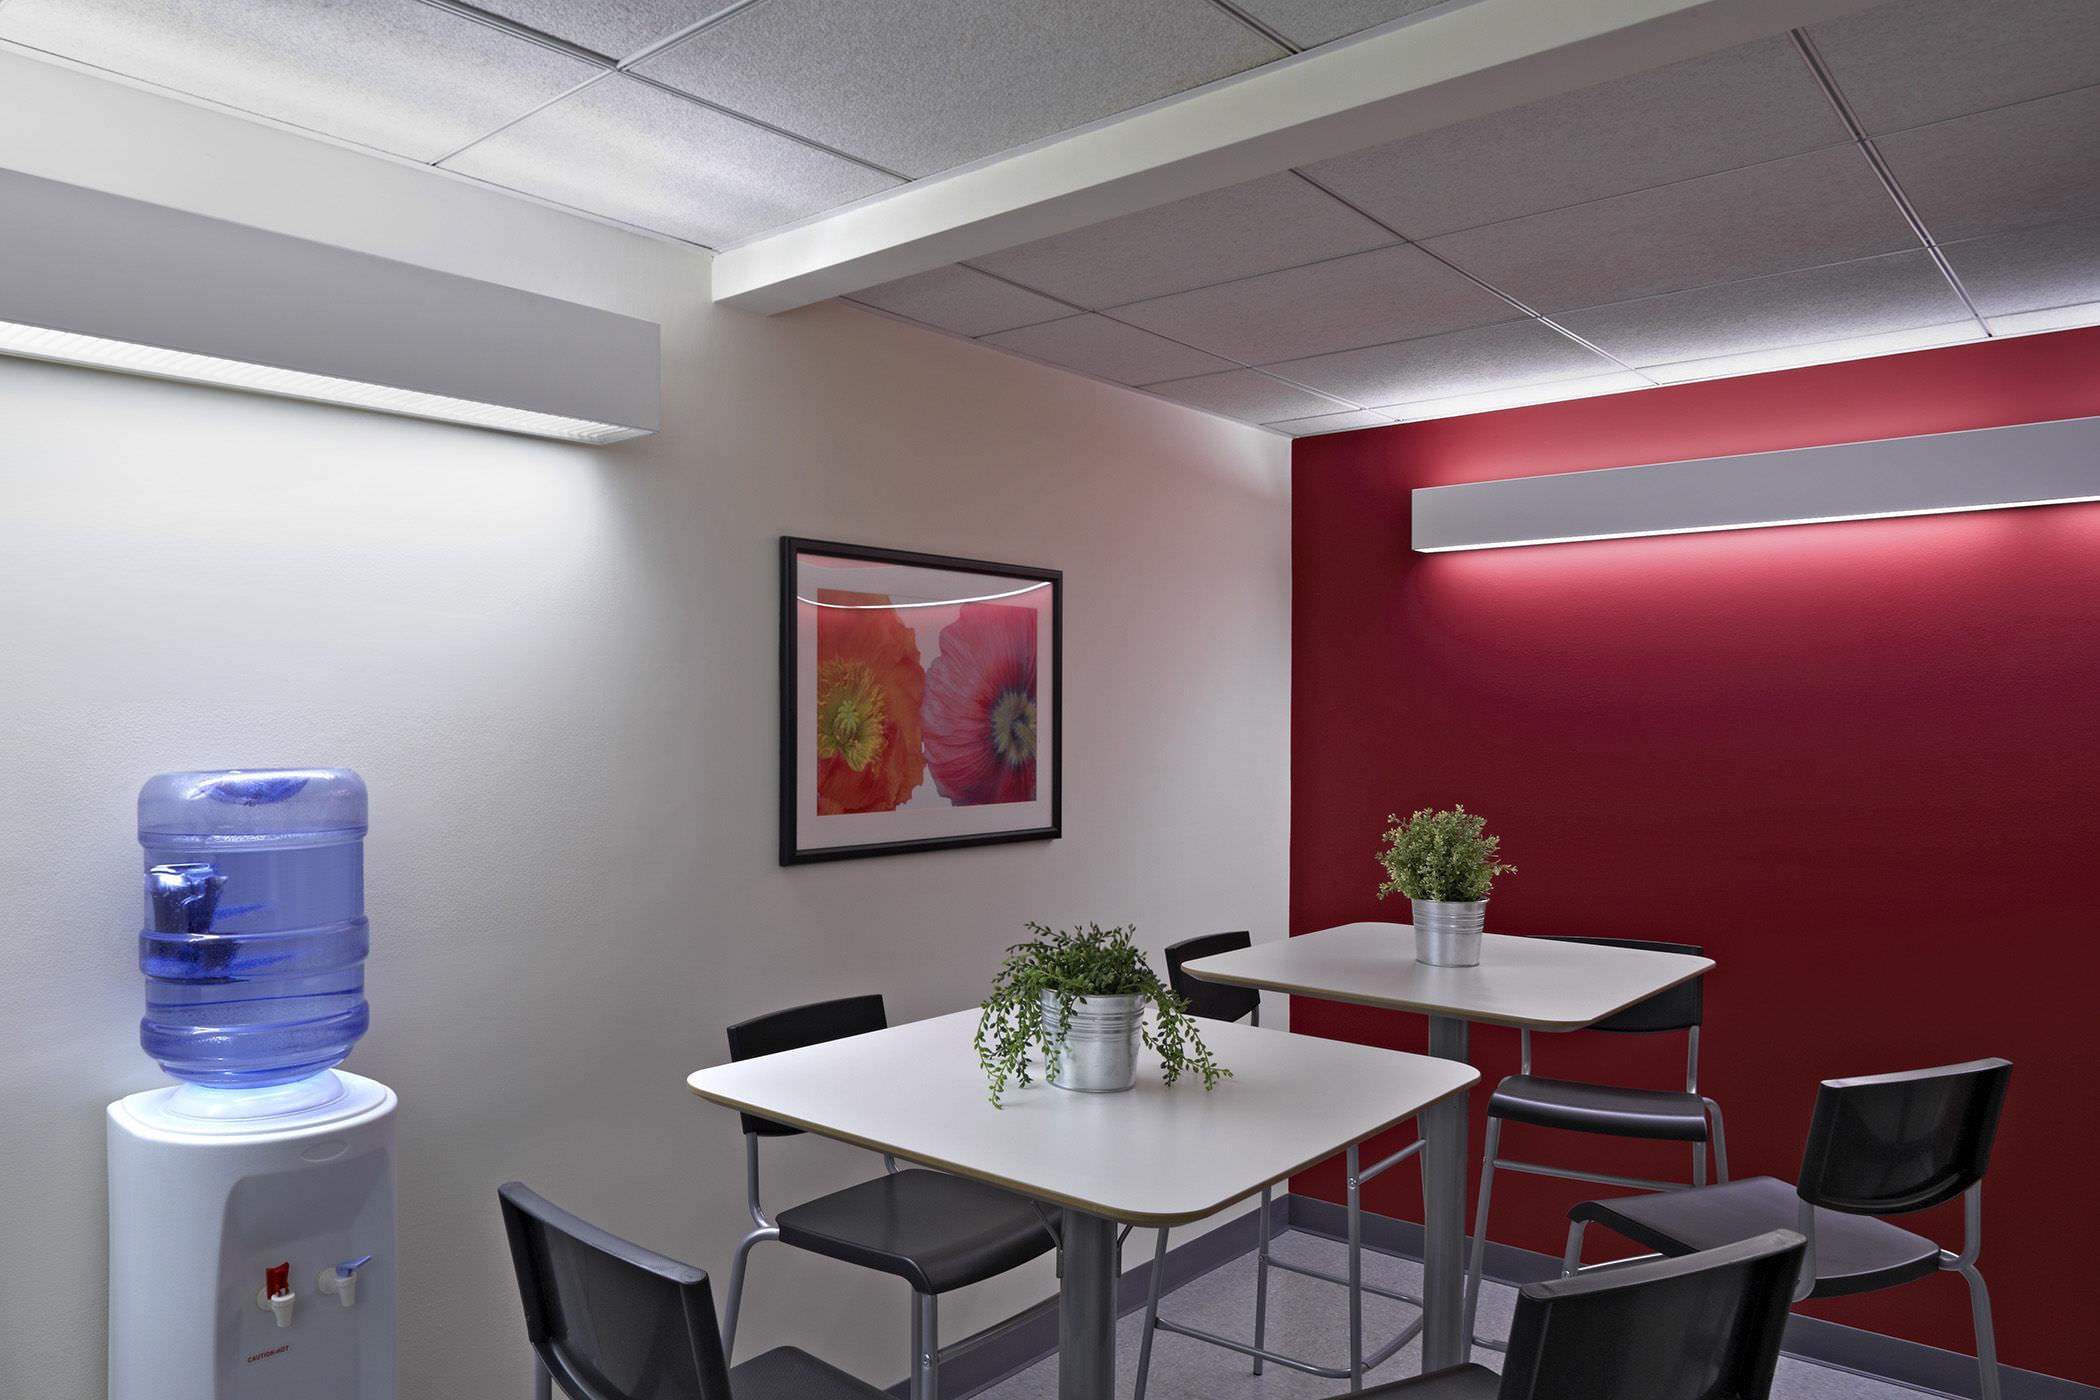 Fluorescent wall mount light fixture lighting designs surface mounted light fixture recessed wall fluorescent aloadofball Image collections